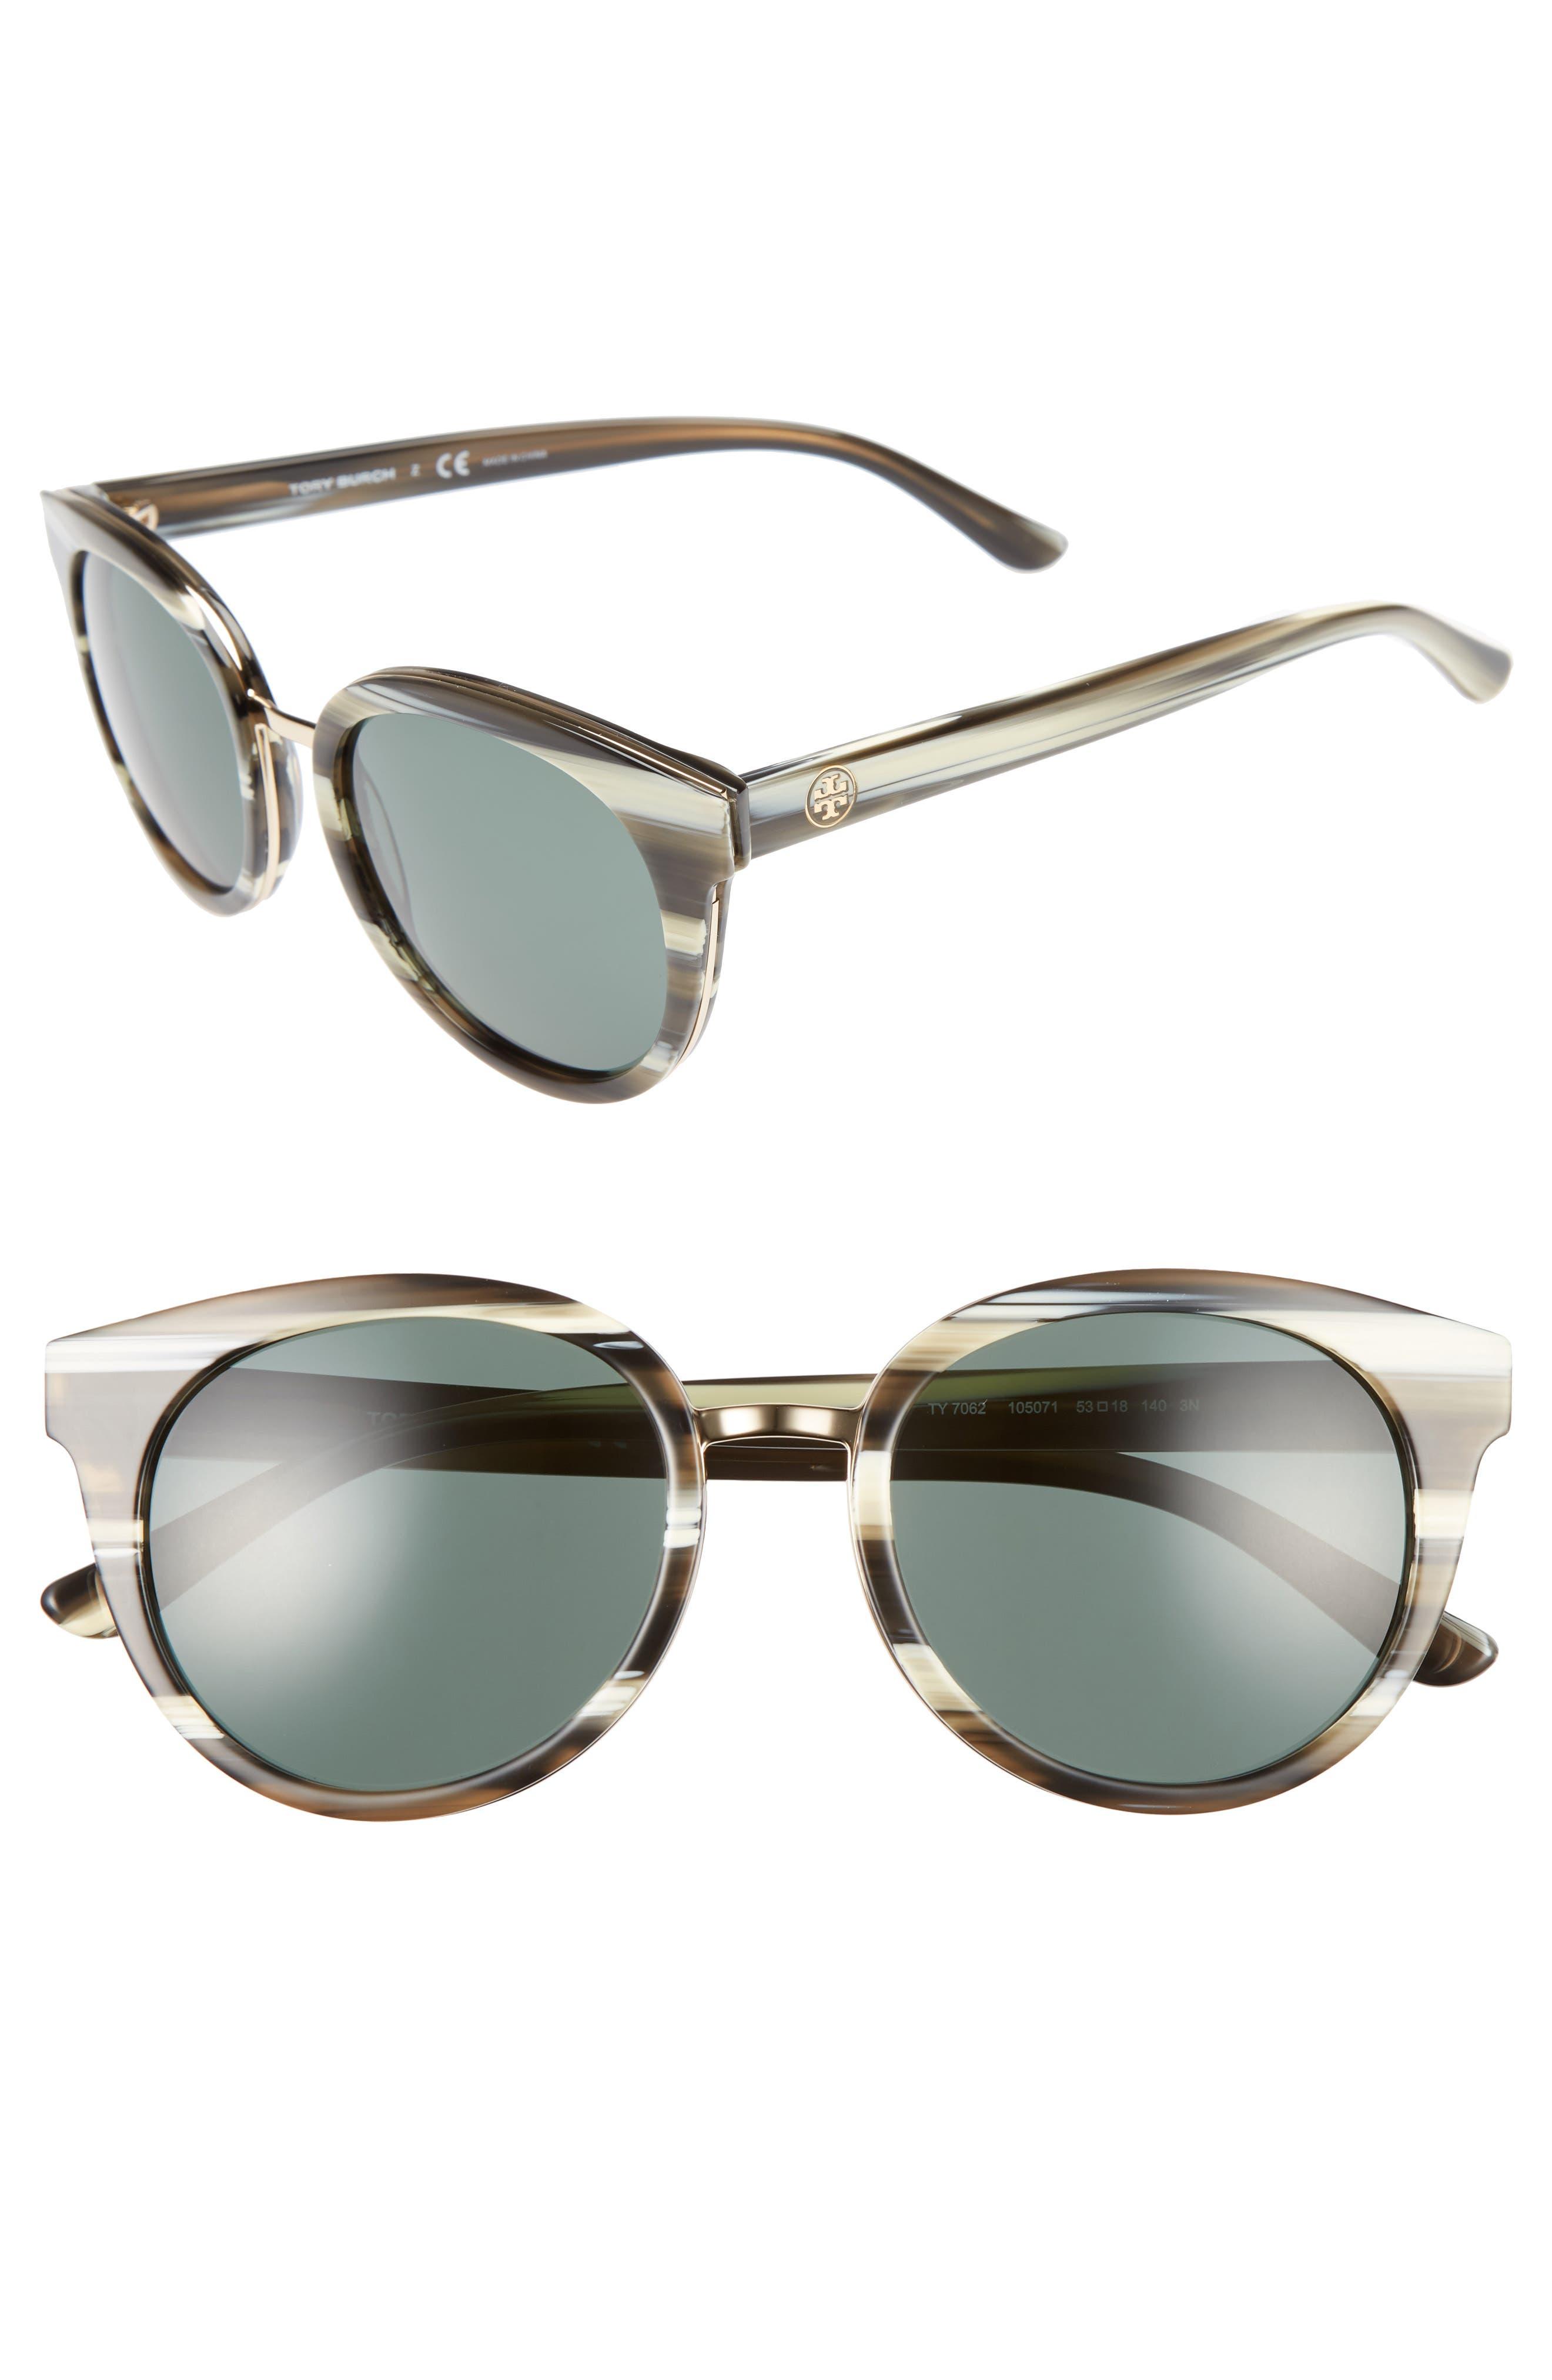 Main Image - Tory Burch 53mm Sunglasses